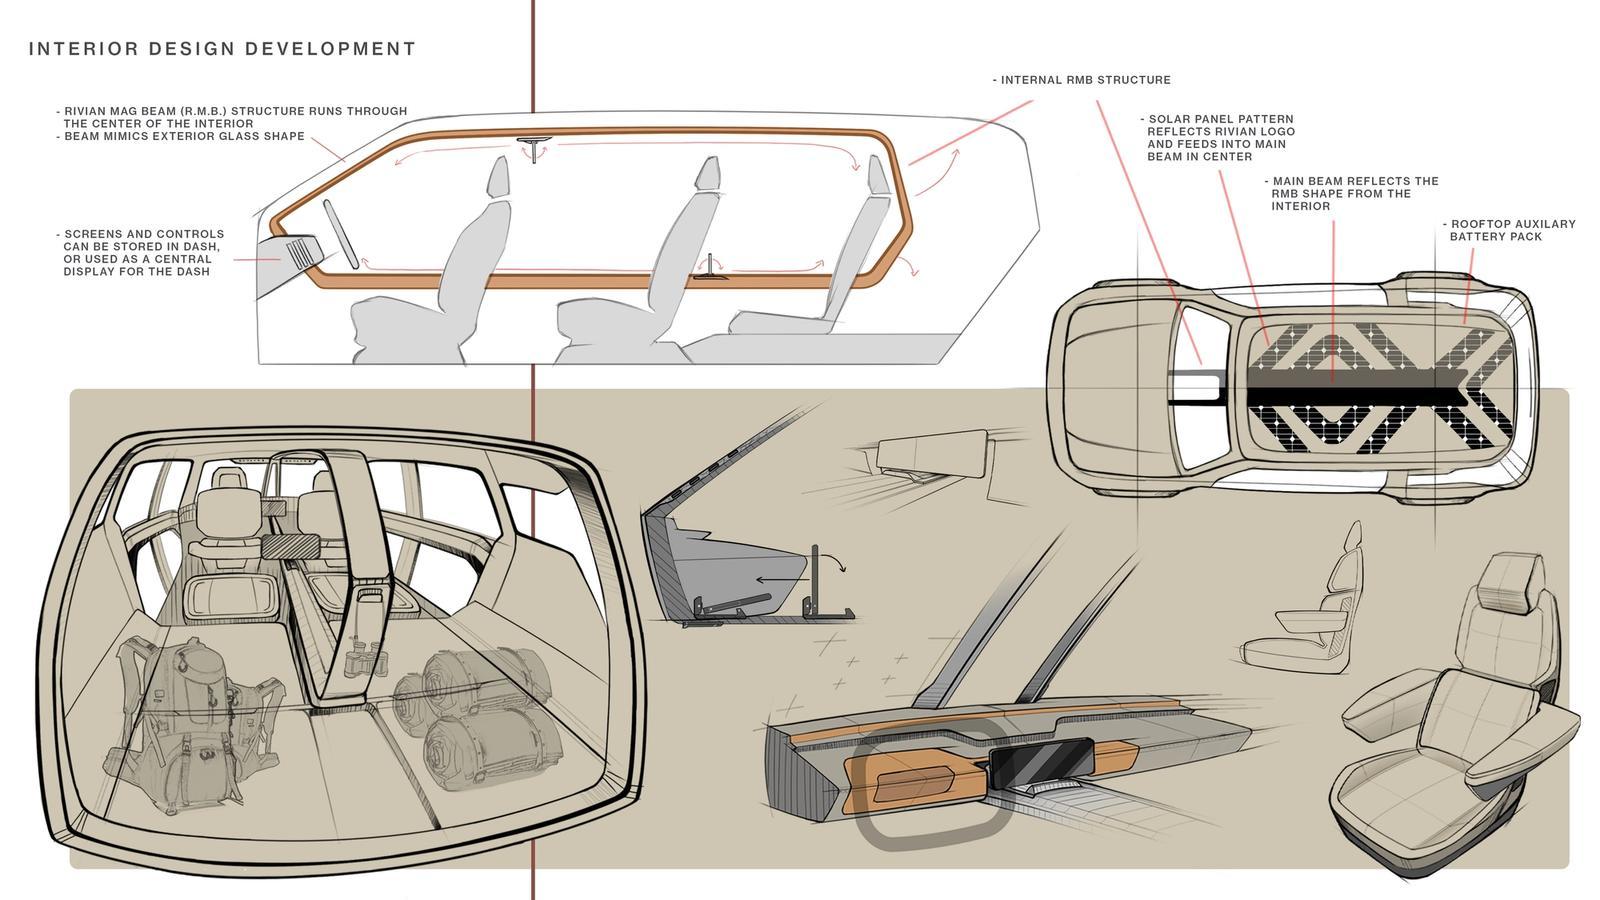 Interior Design Ideation